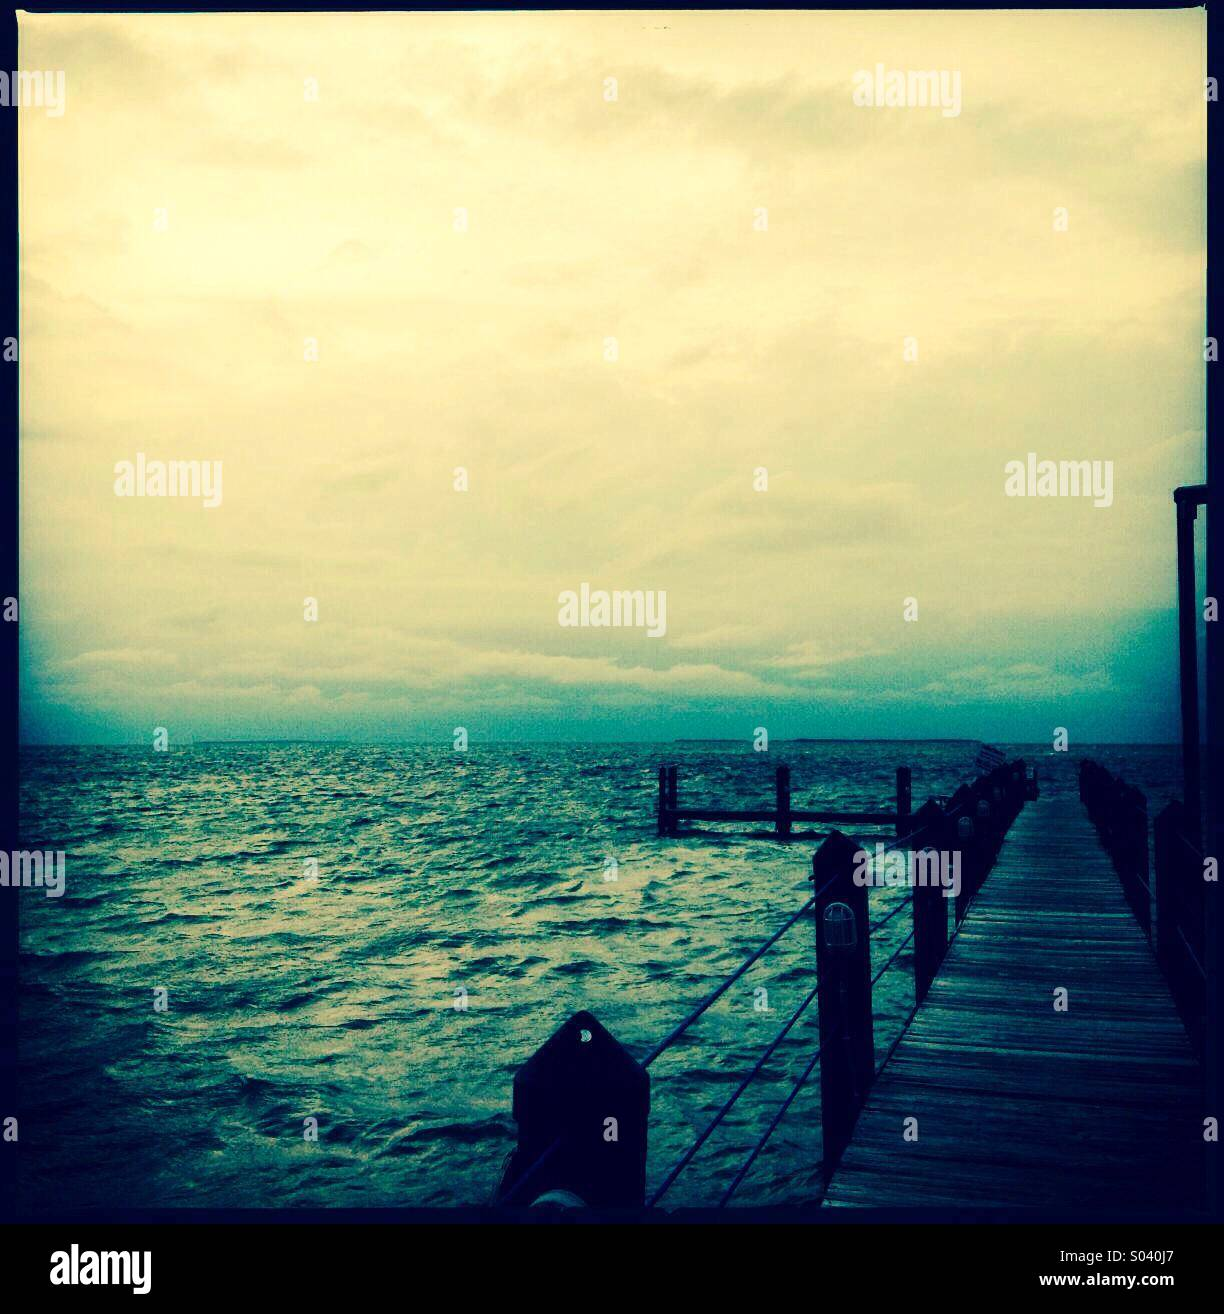 Dock in Florida, USA - Stock Image